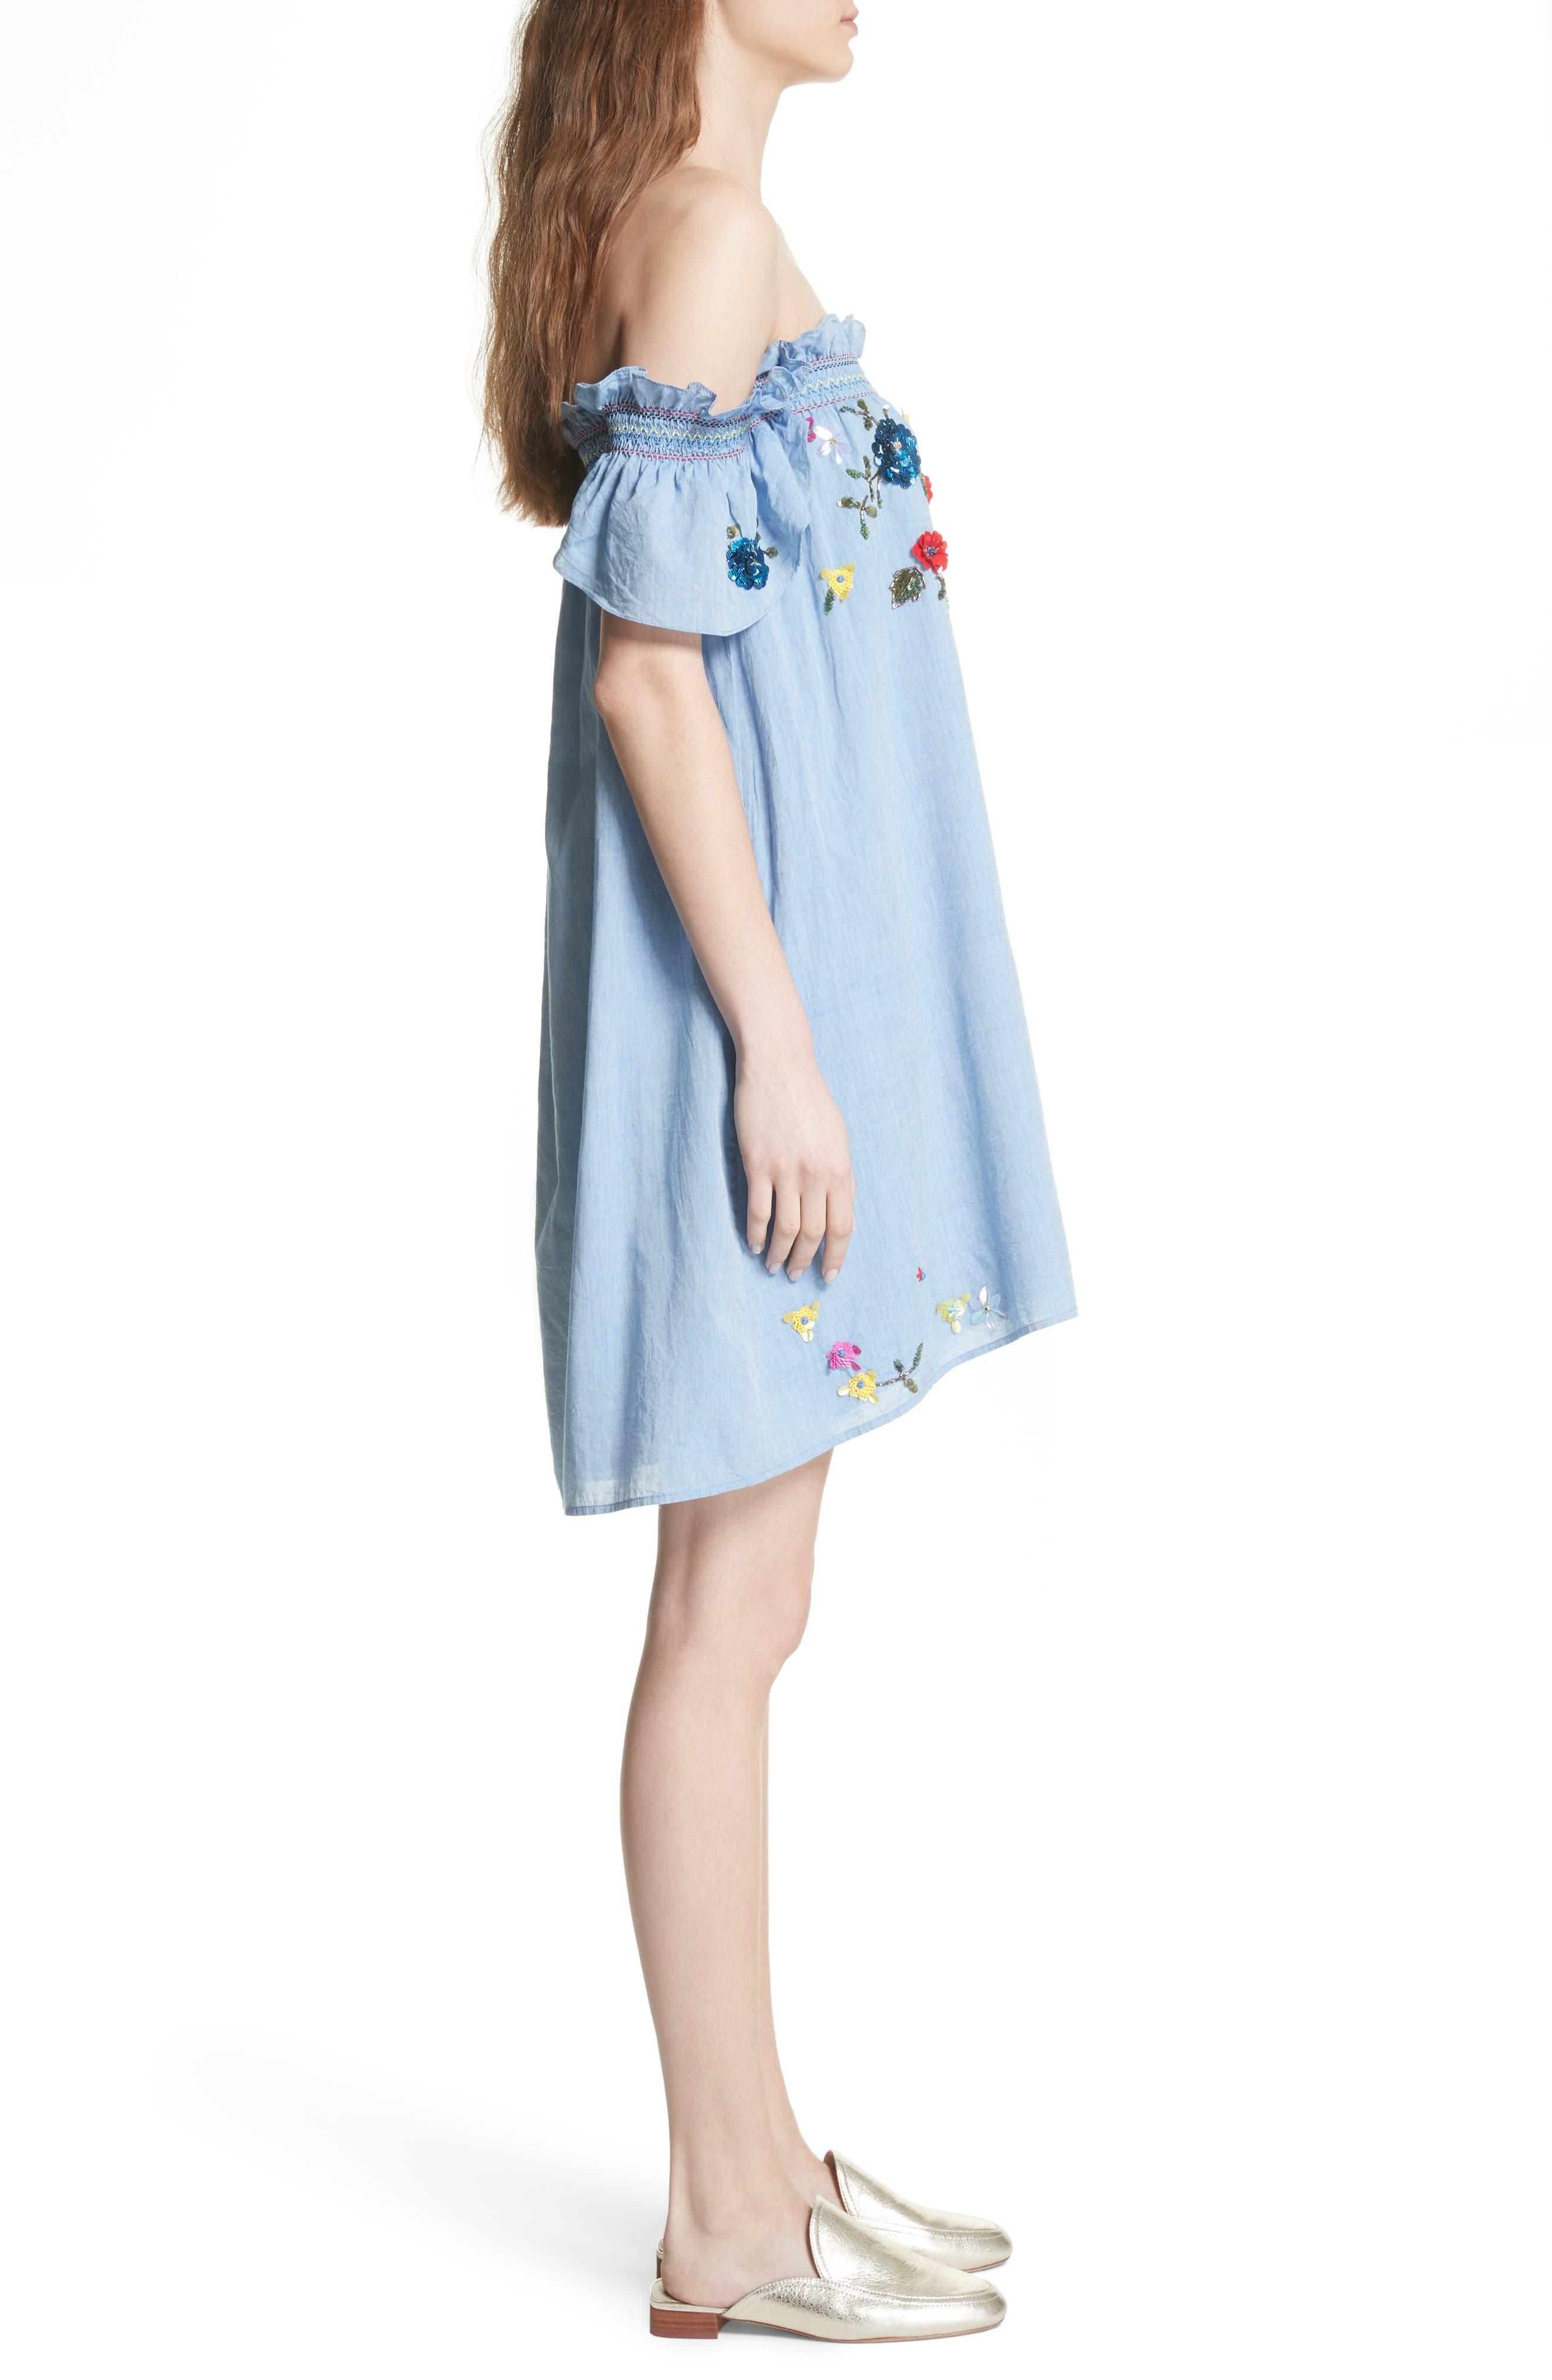 Clarimonde Embroidered Off the Shoulder Cotton Dress,                             Alternate thumbnail 3, color,                             400